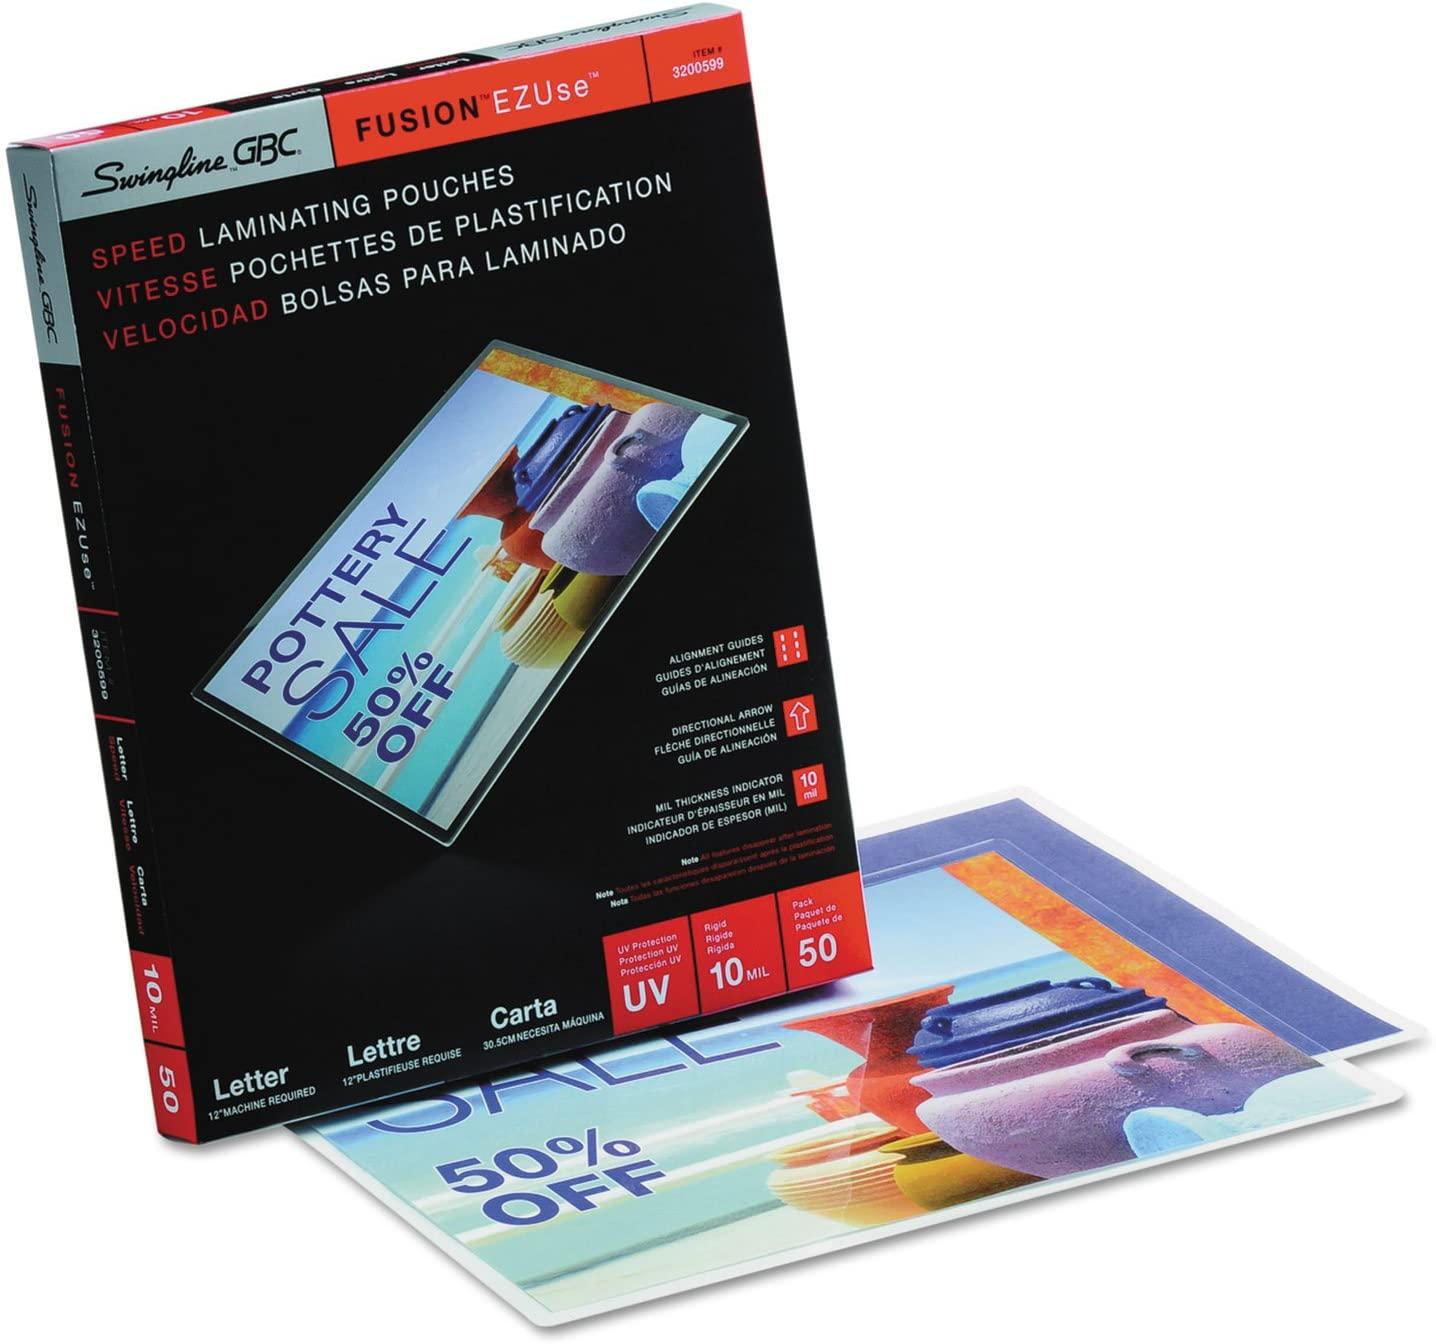 Swingline GBC 3200599 Fusion EZUse Premium Laminating Pouches 10 mil 11 1/2 x 9 50/Box